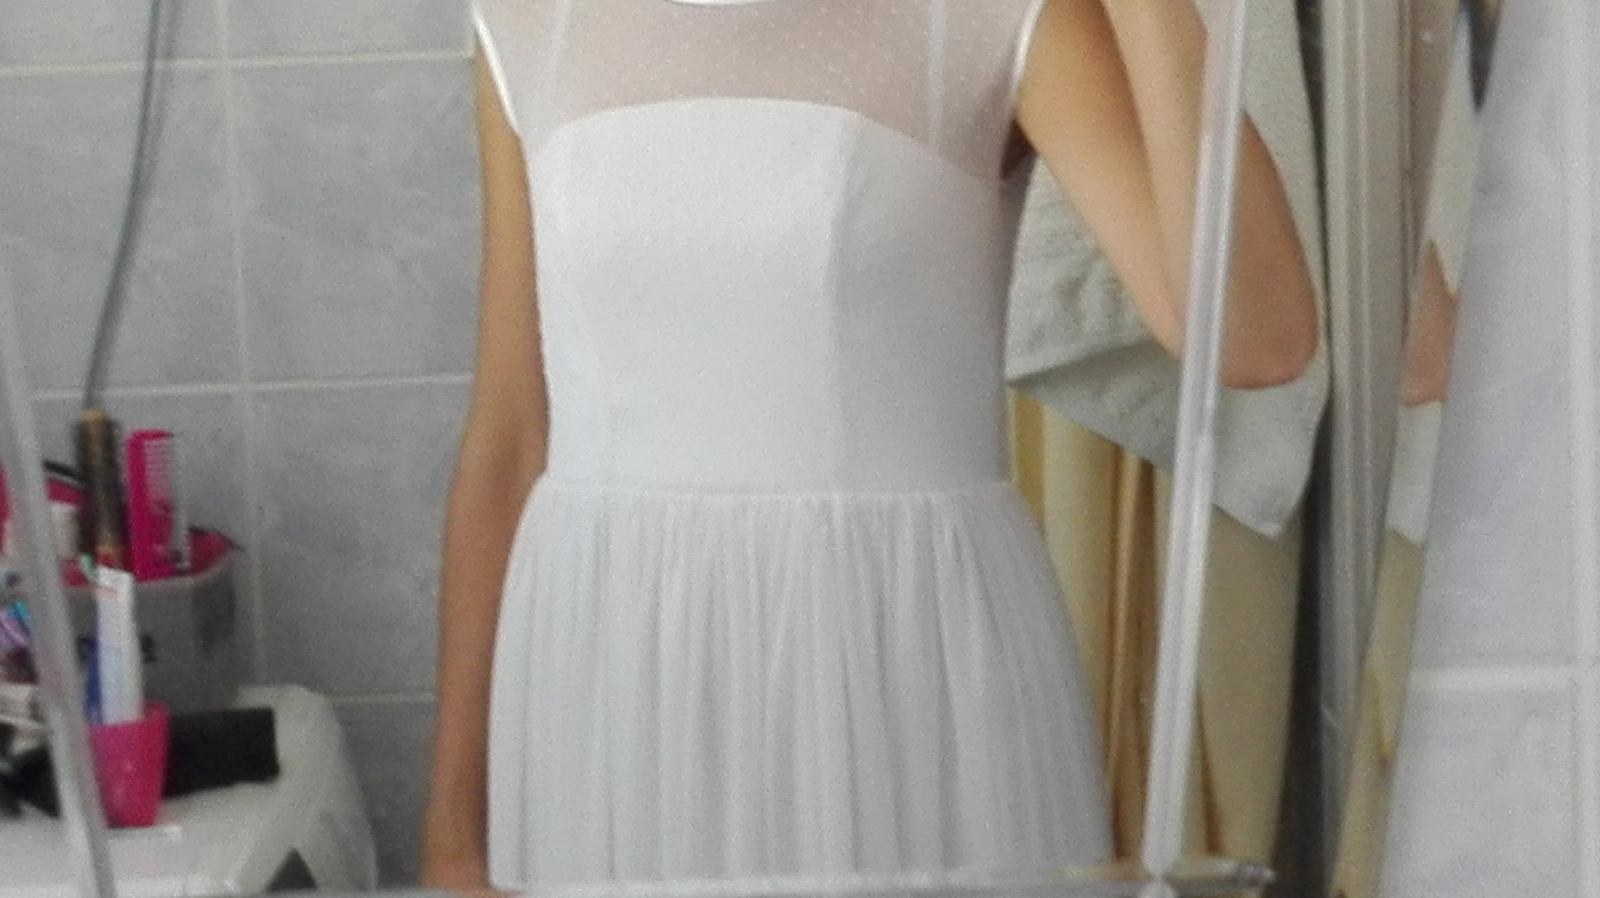 Krátke svadobné šaty 36/38 - Obrázok č. 3